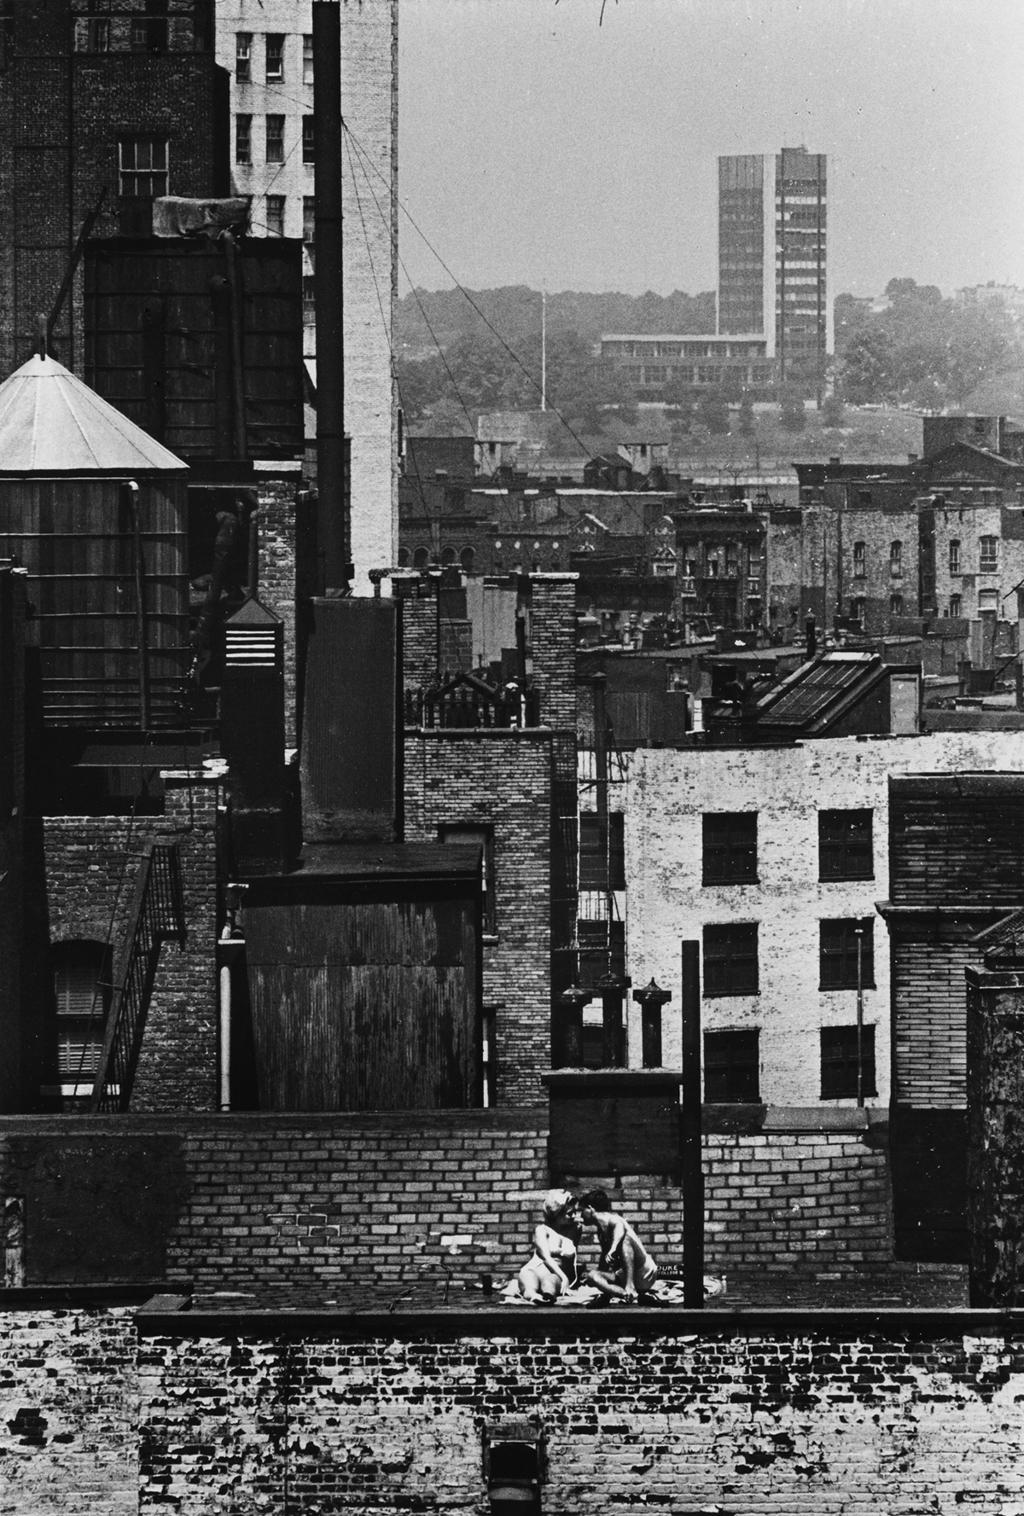 New York, il 6 giugno 1965. - (André Kertész)